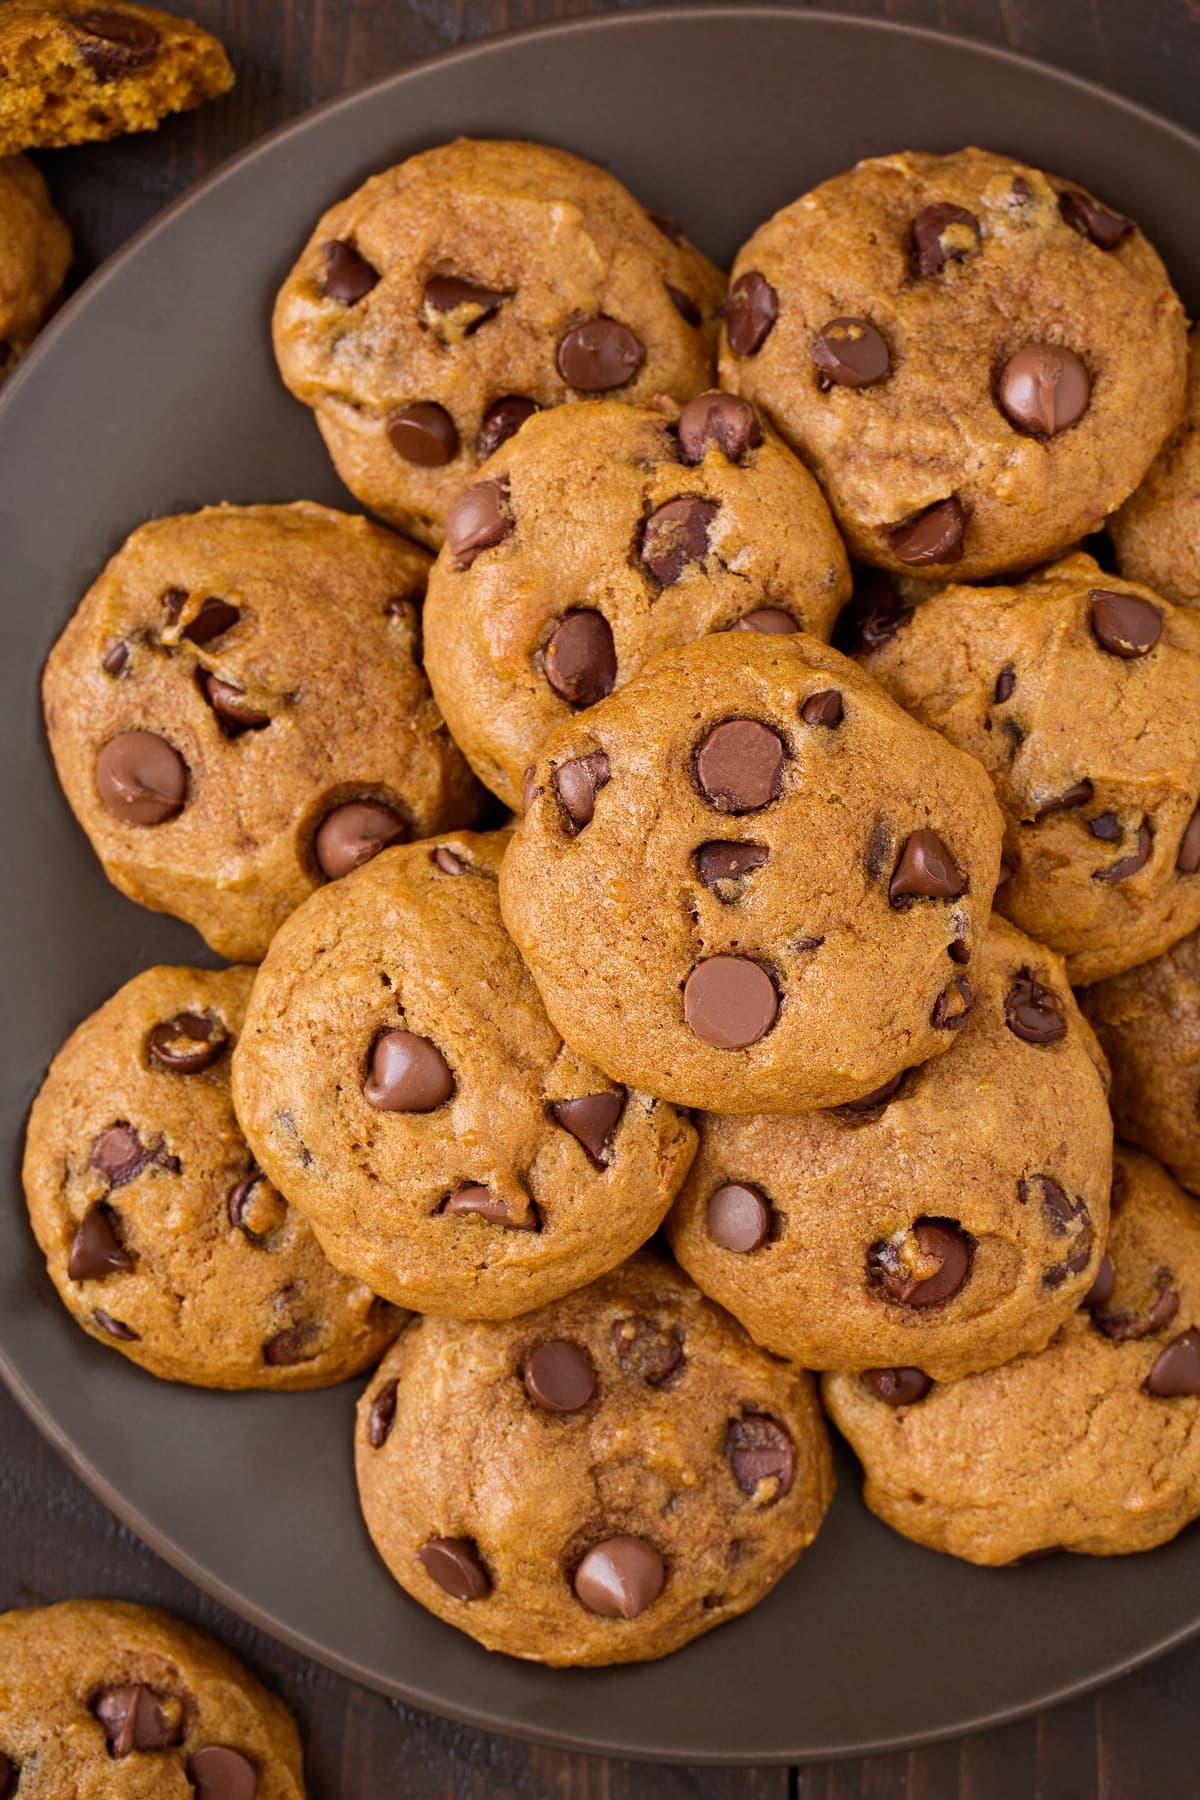 Pumpkin Chocolate Chip Cookies on serving plate.